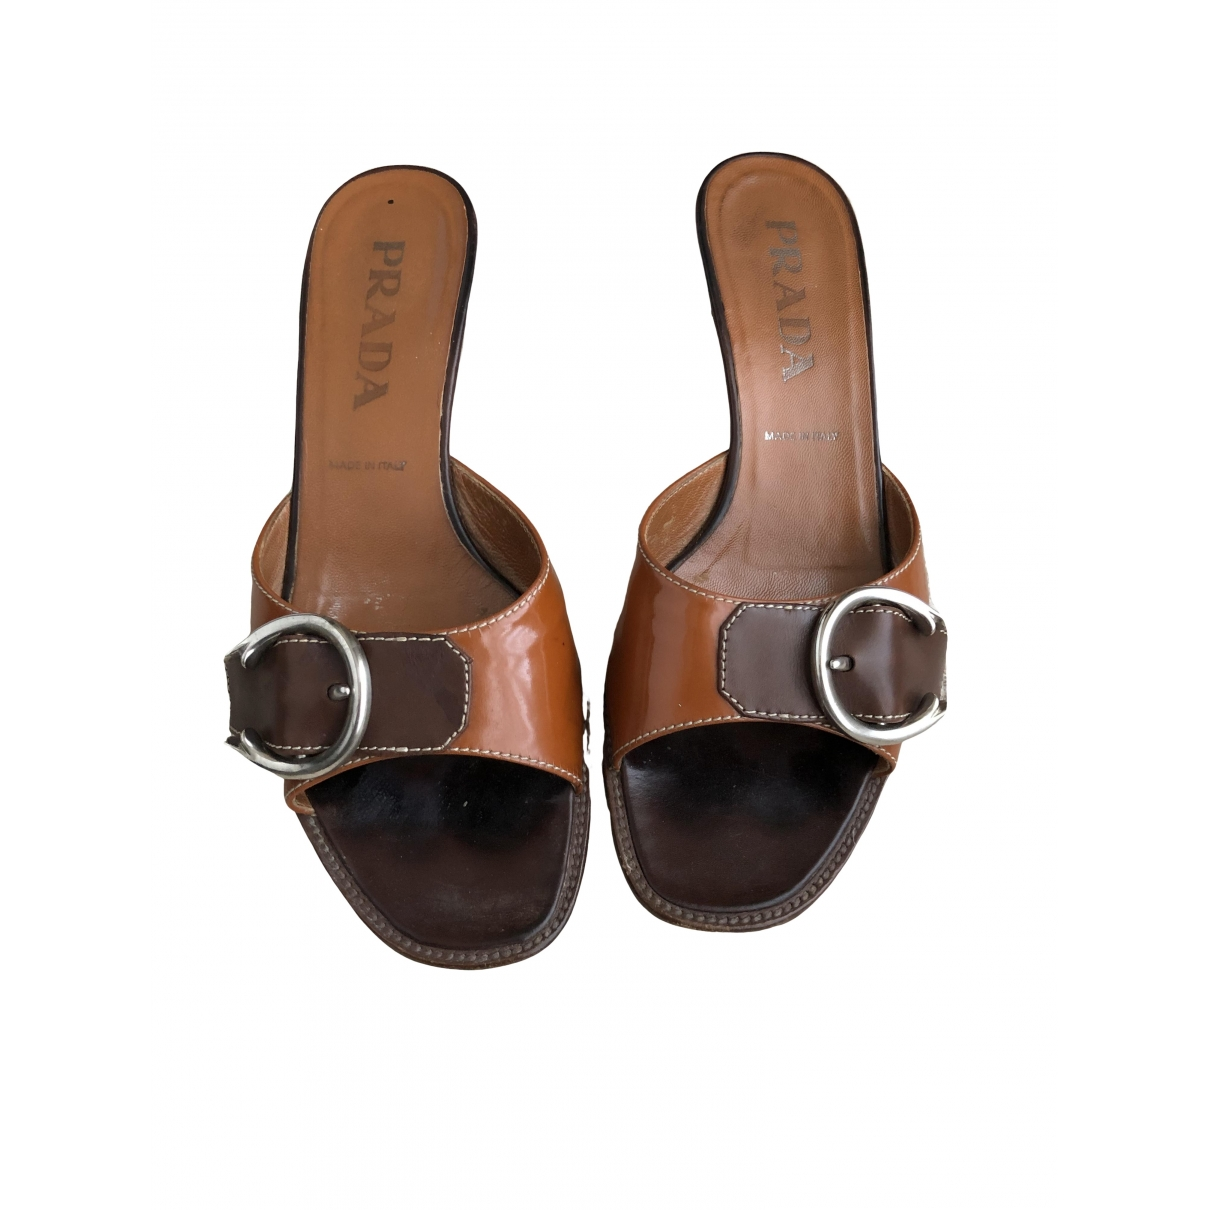 Prada \N Brown Leather Mules & Clogs for Women 37 EU